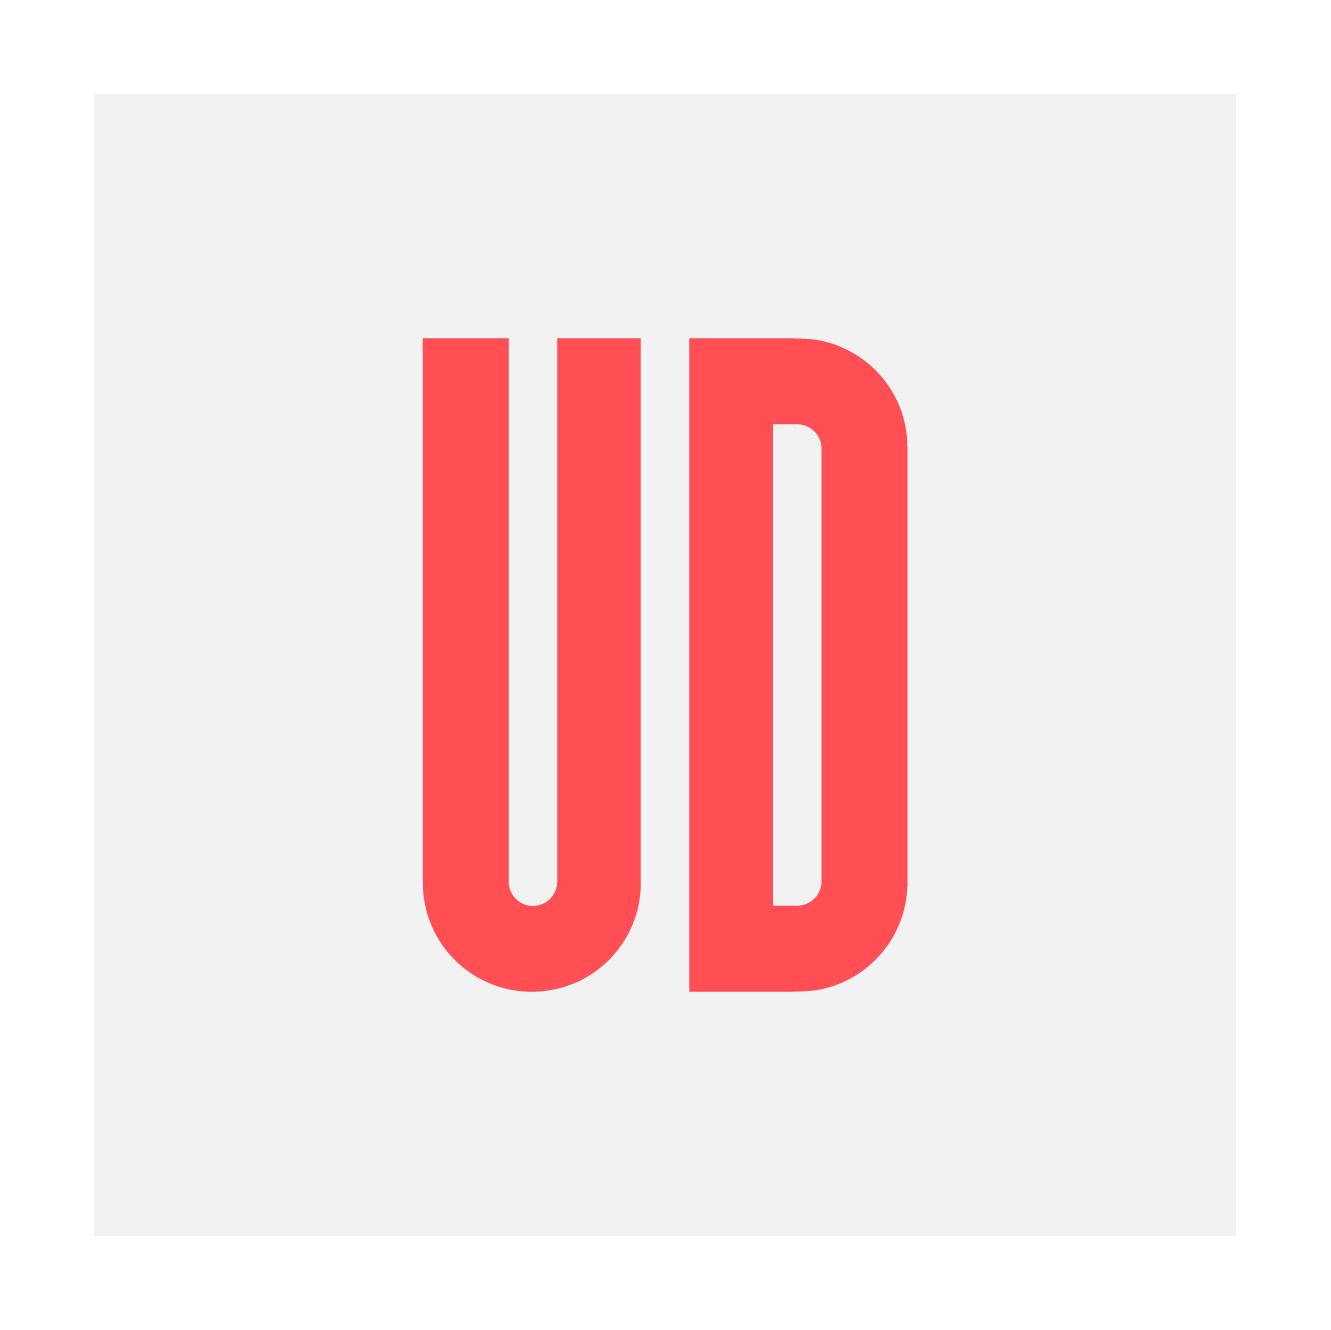 Logotip UD